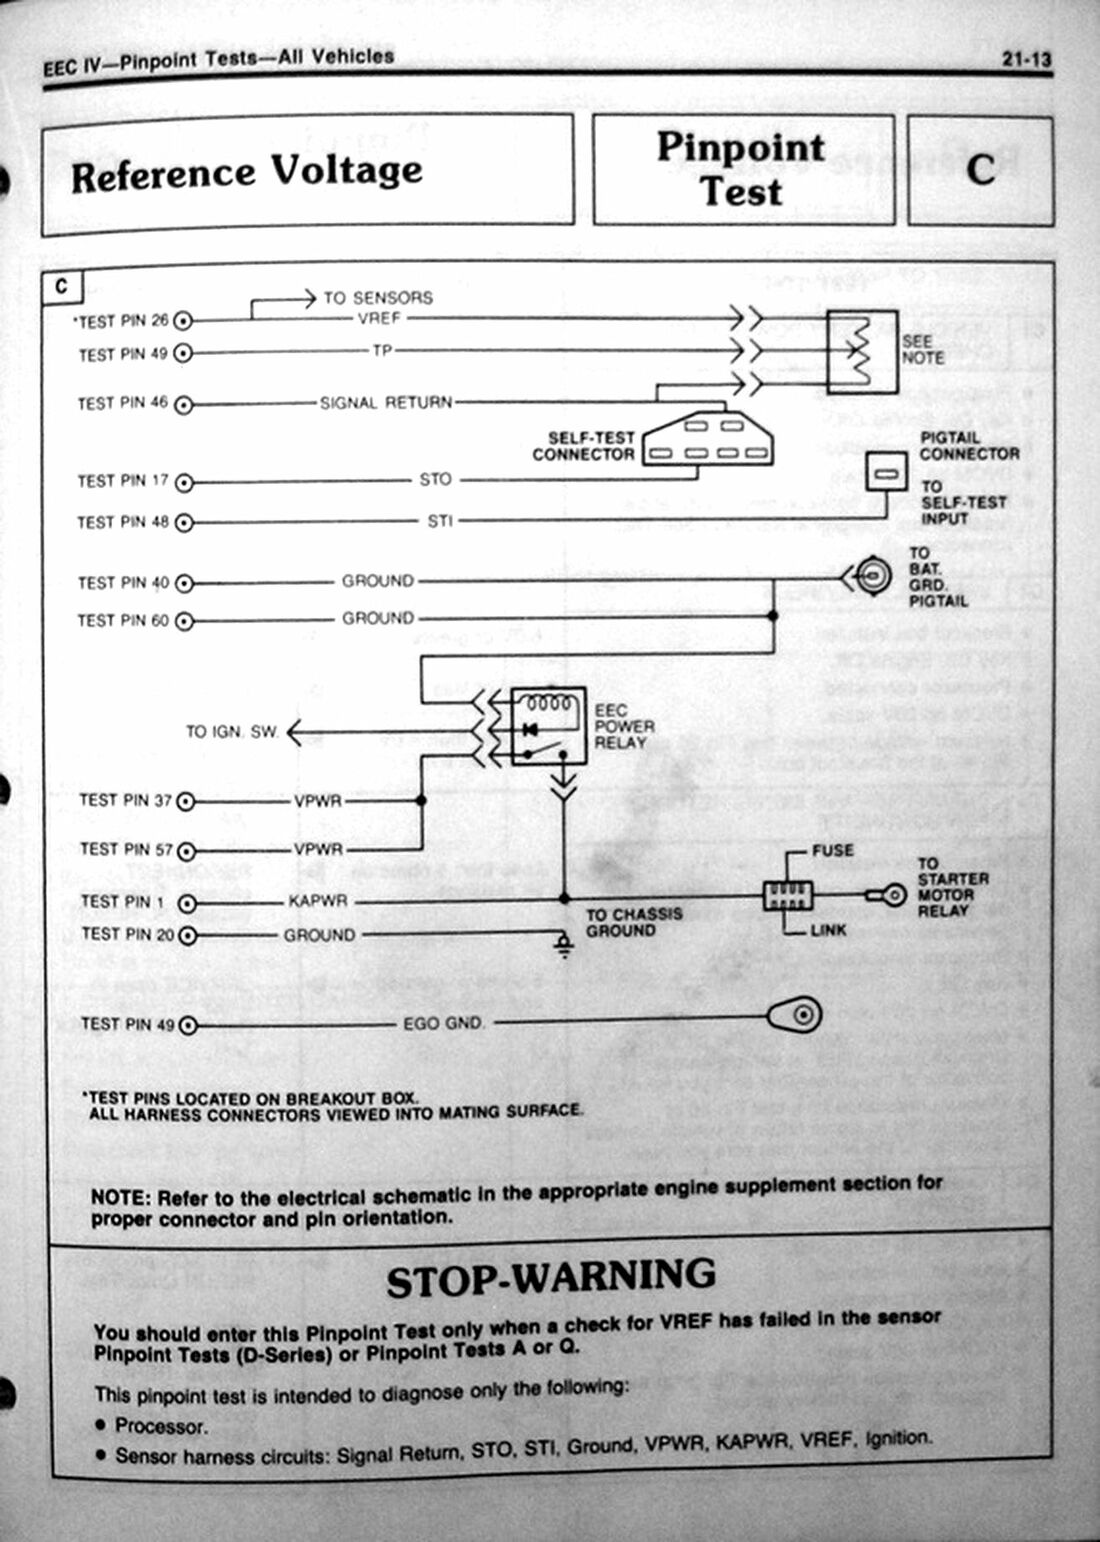 hight resolution of eec iv wiring diagram 4 9 advance wiring diagram eec iv wiring diagram 4 9